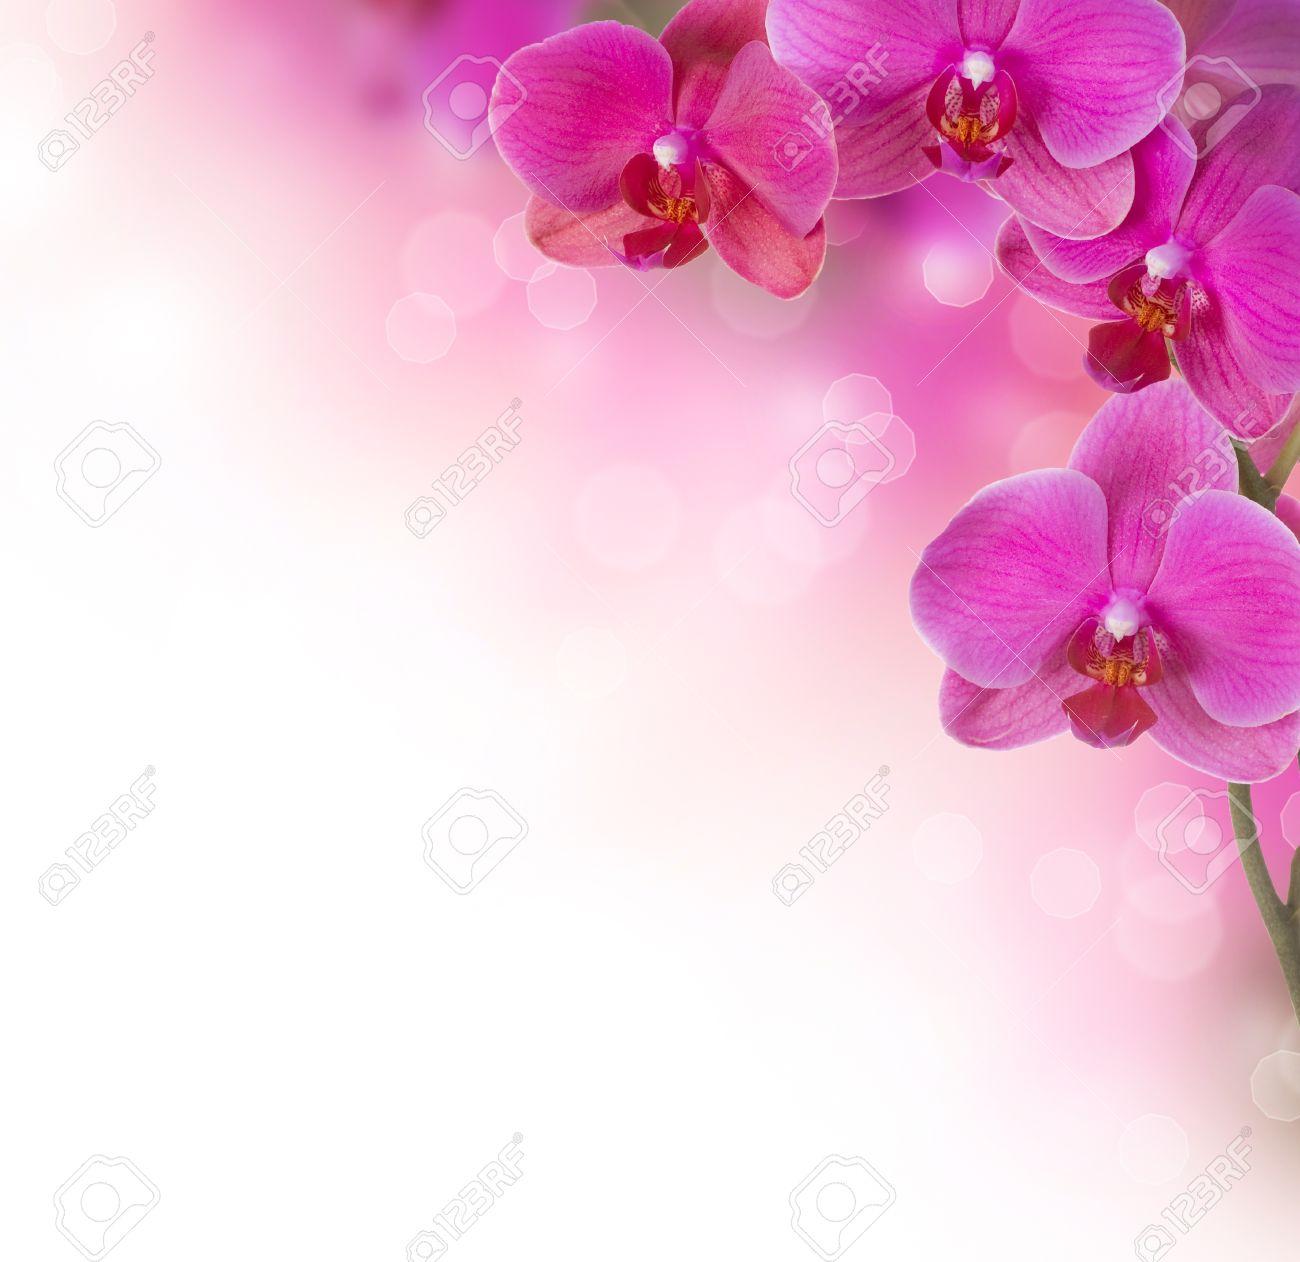 Orchid Flower border design Stock Photo - 11559860